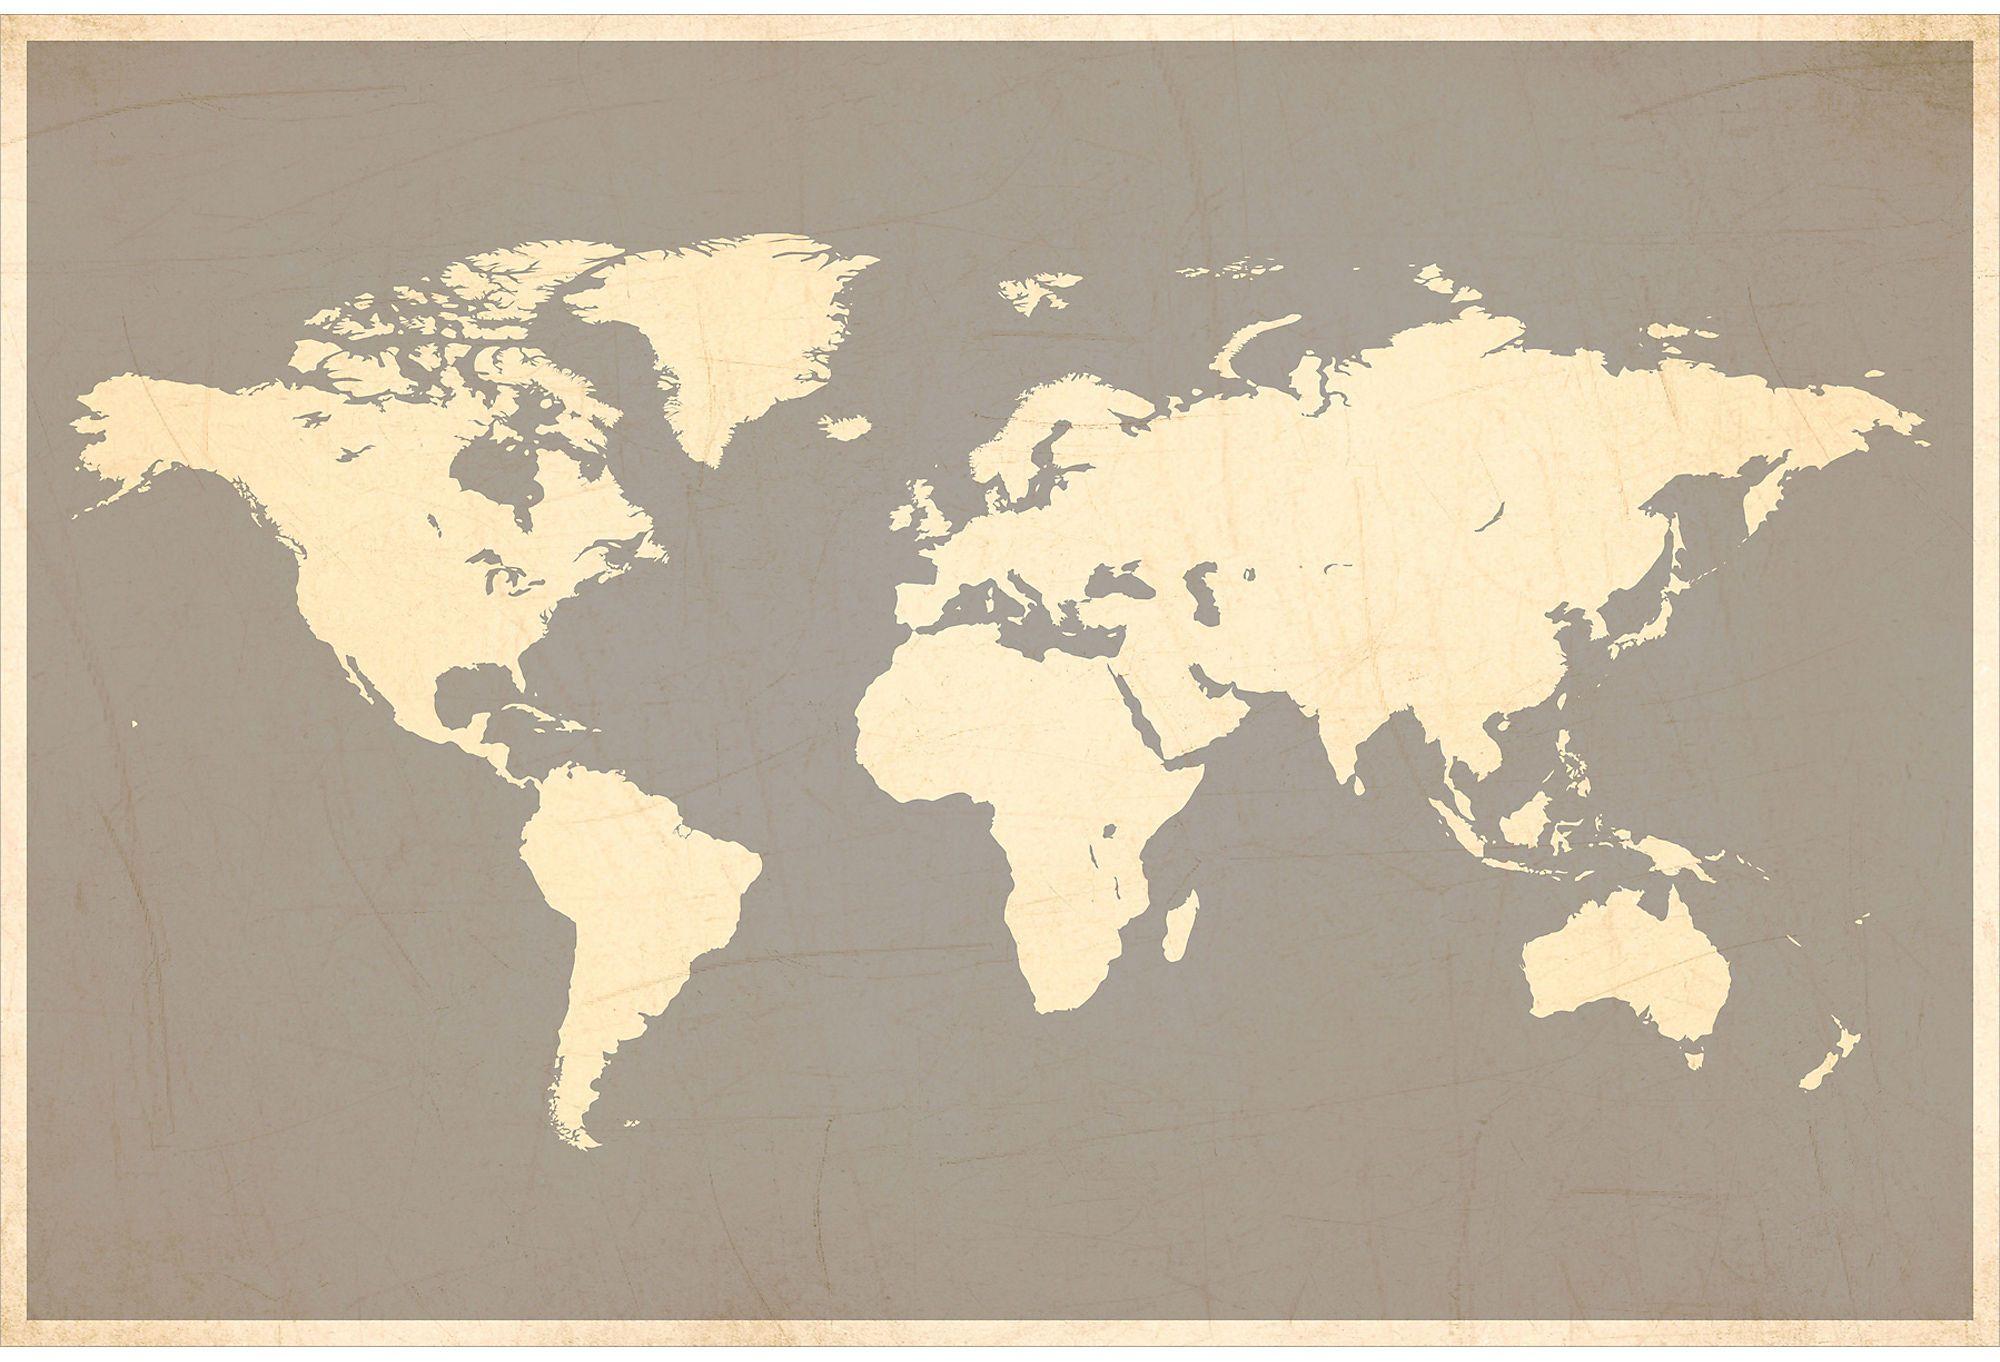 World map print by fresh words market maps art decor prints world map print by fresh words market maps art decor gumiabroncs Choice Image